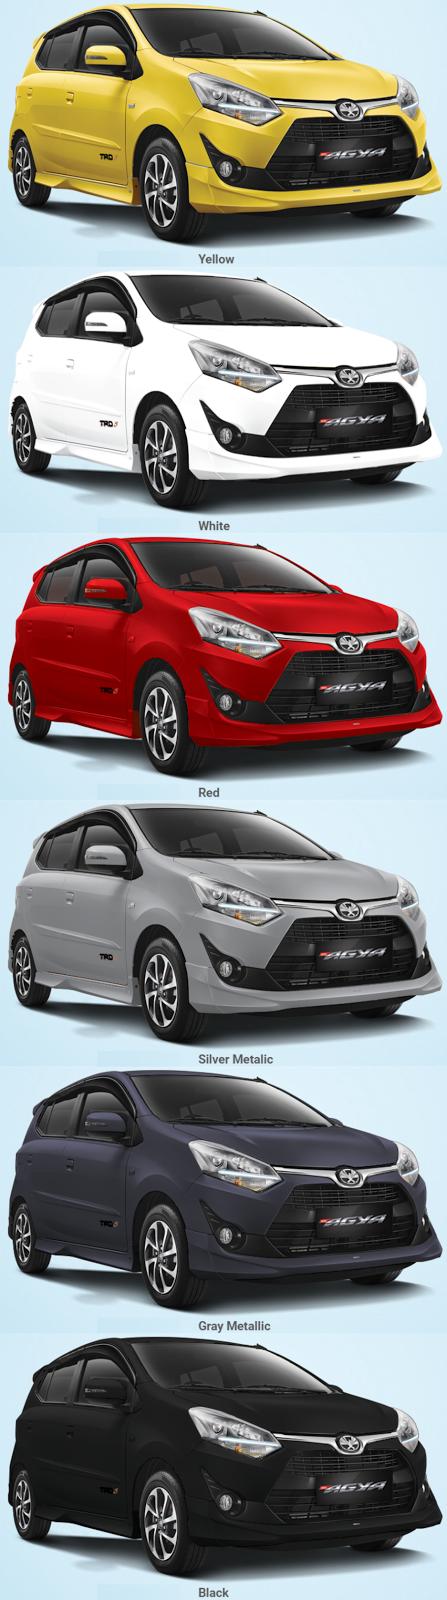 warna-mobil-new-agya